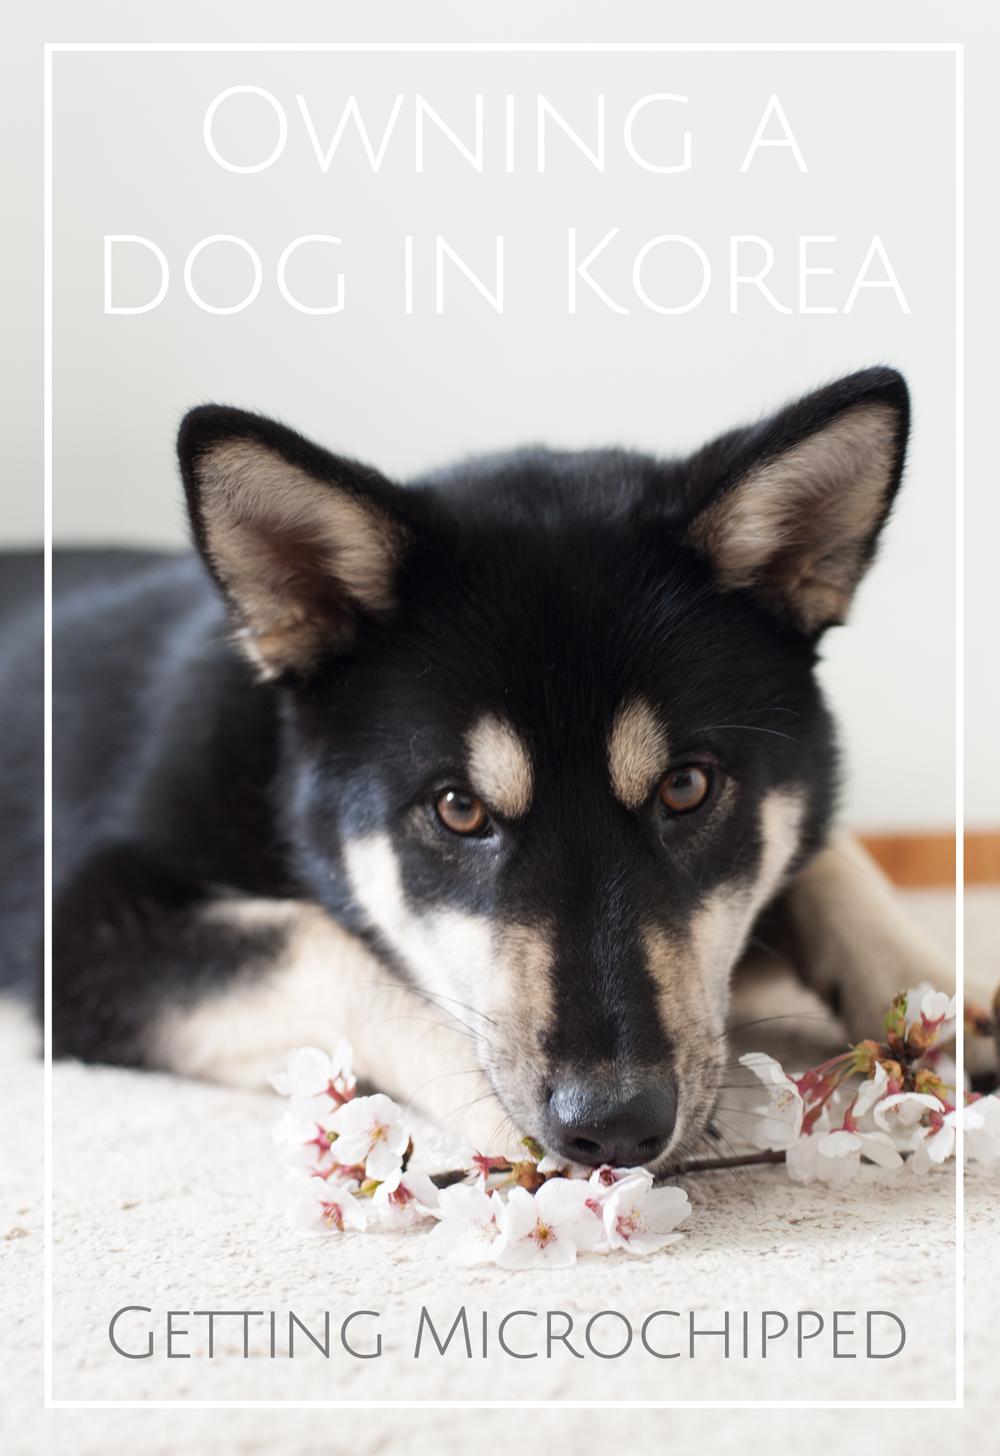 Microchipping dog in Korea